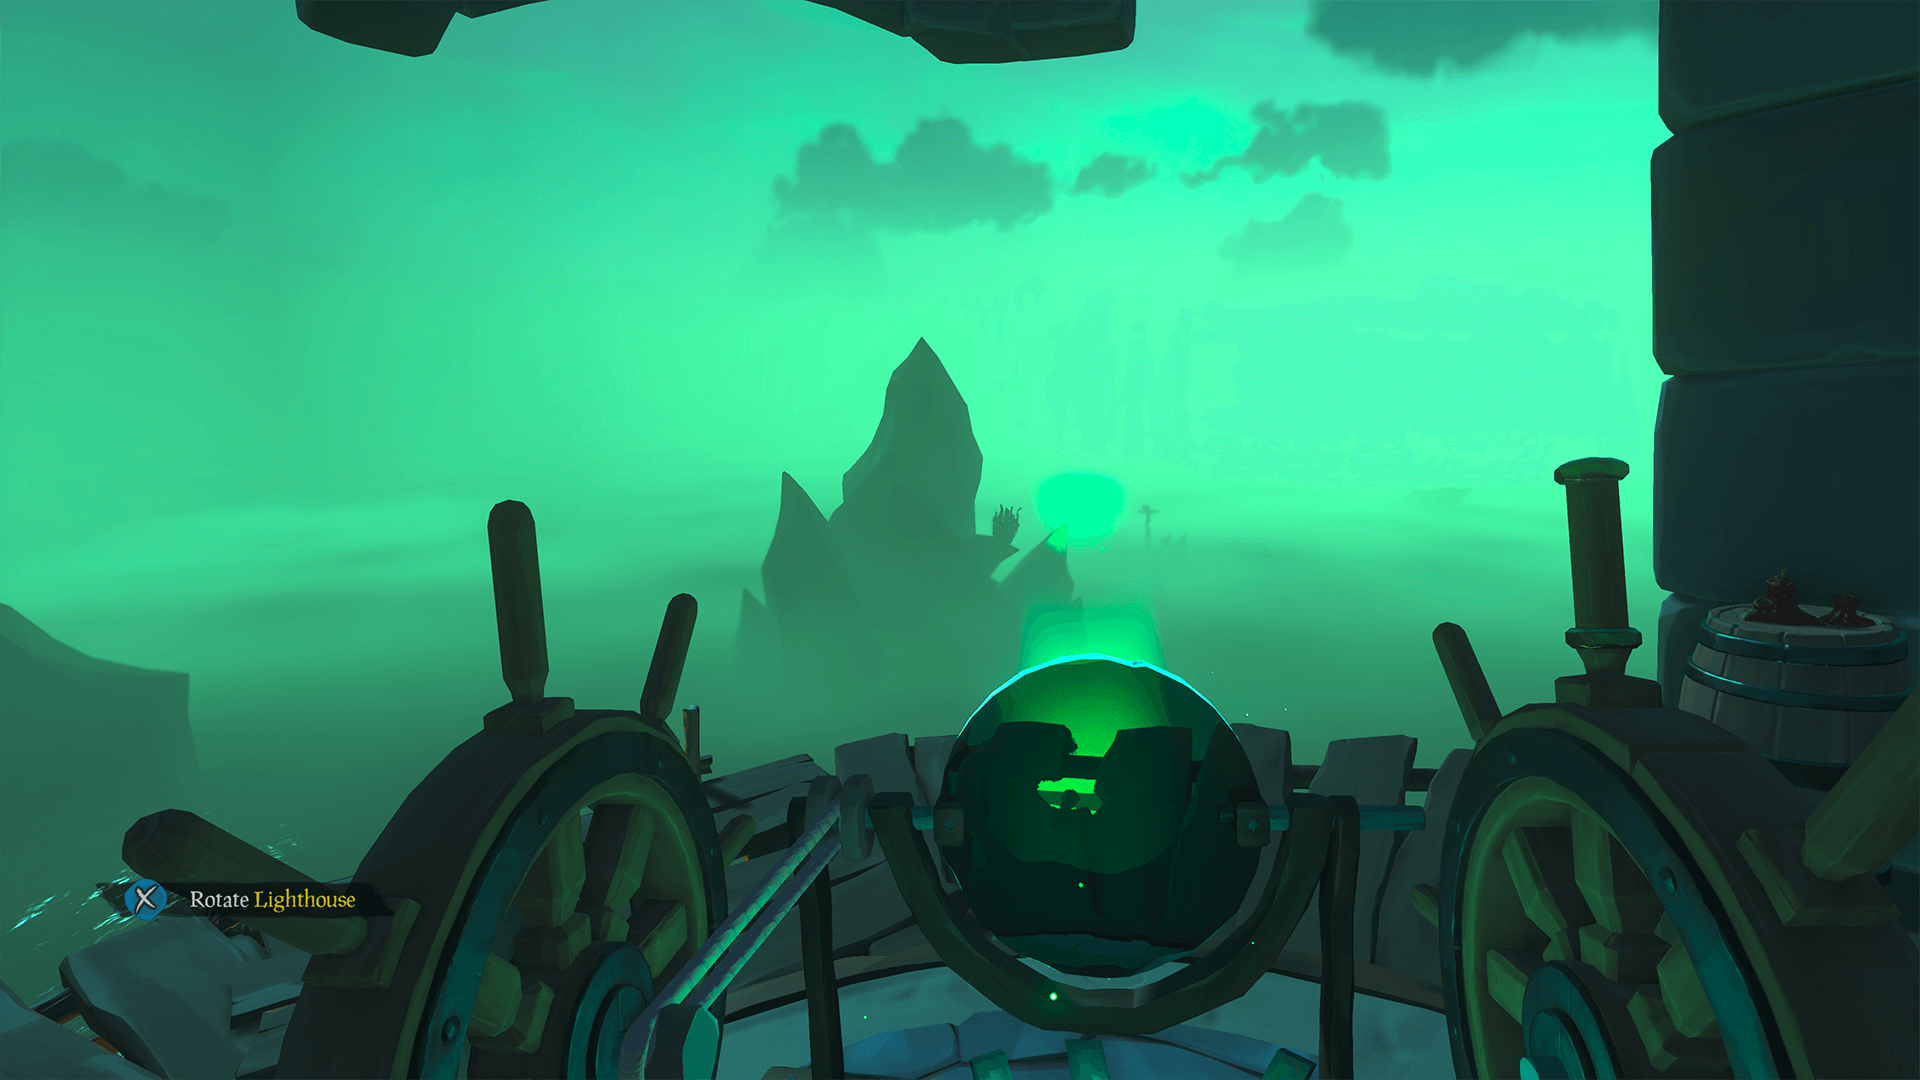 Rotate Lighthouse